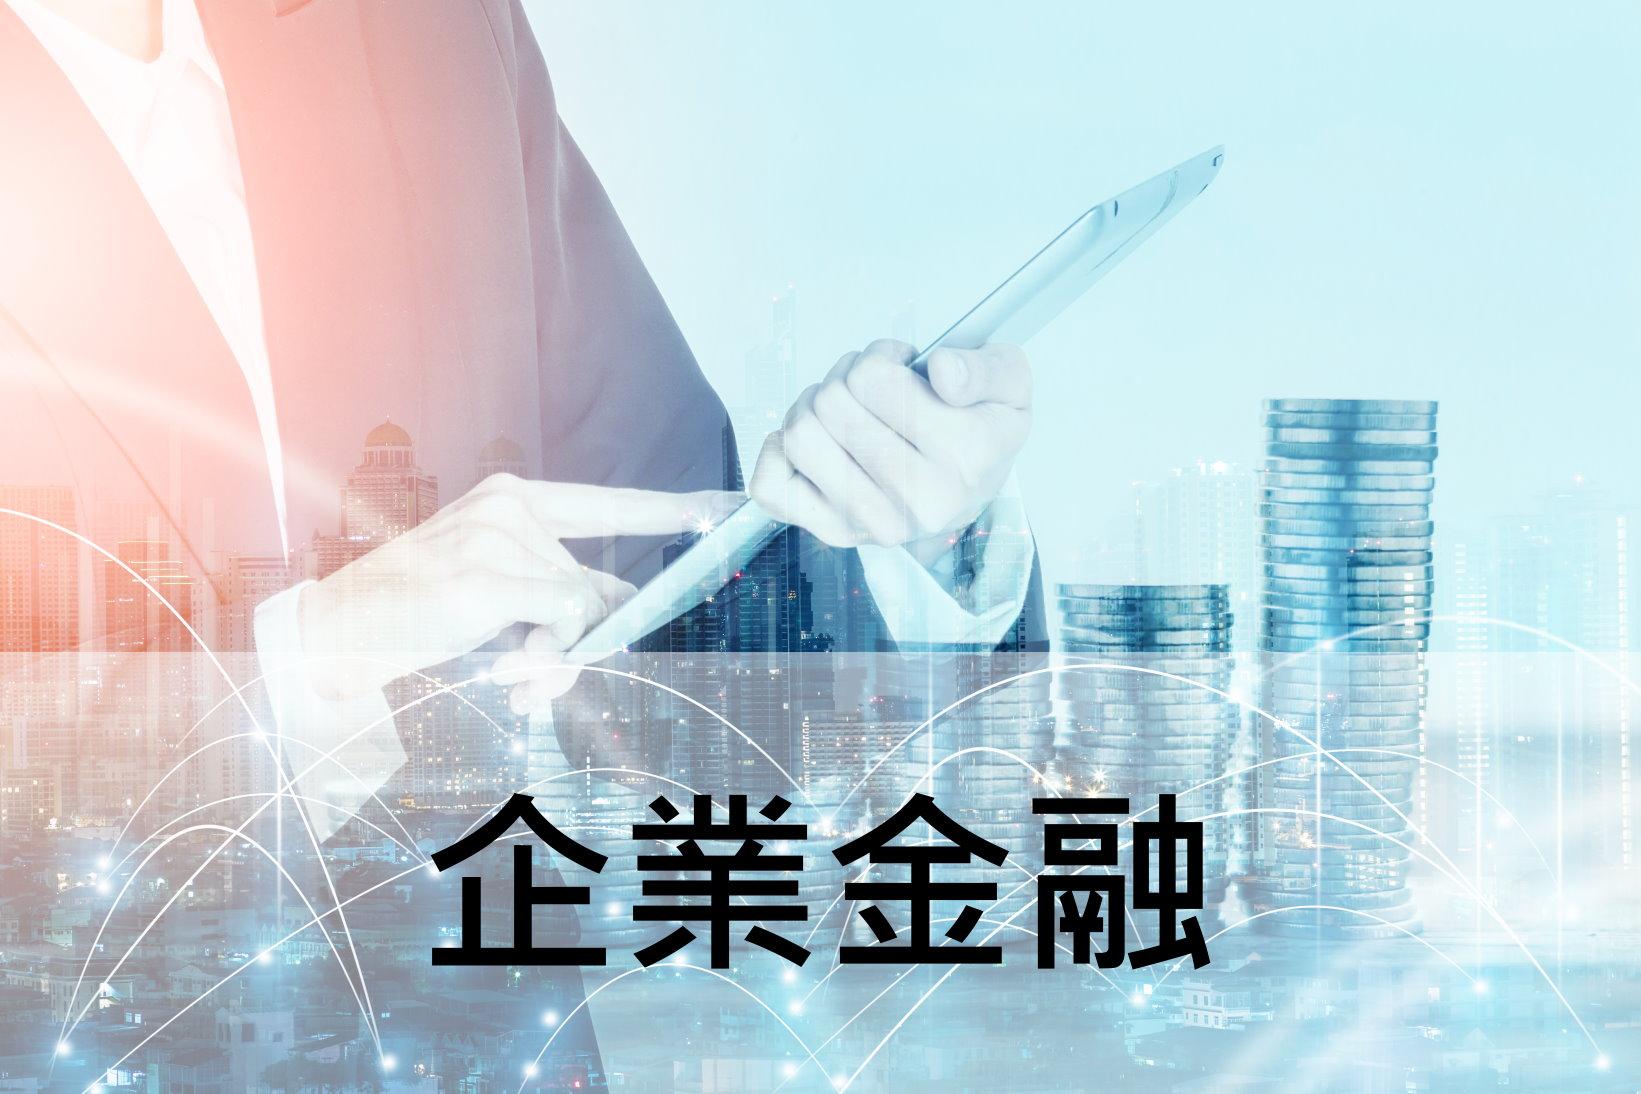 Digital Finance 08 26 01